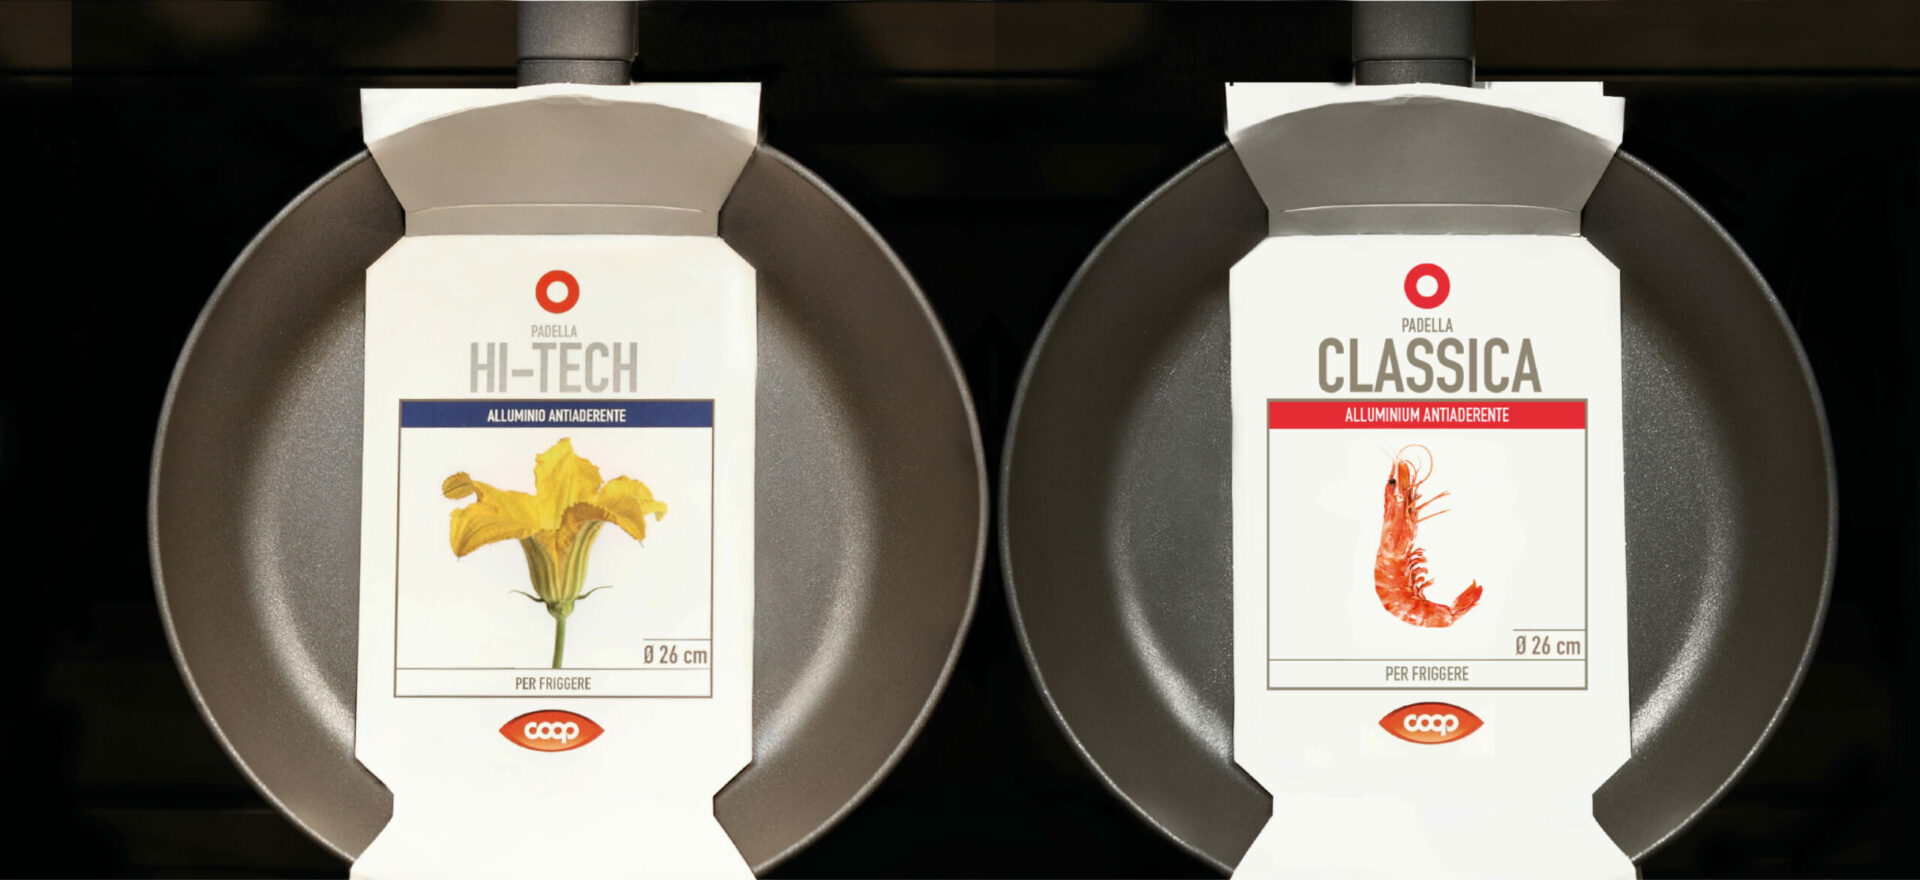 Frying pan packaging | Graphic Design | Branding | Coop Italia| Mario Trimarchi Design | Fragile